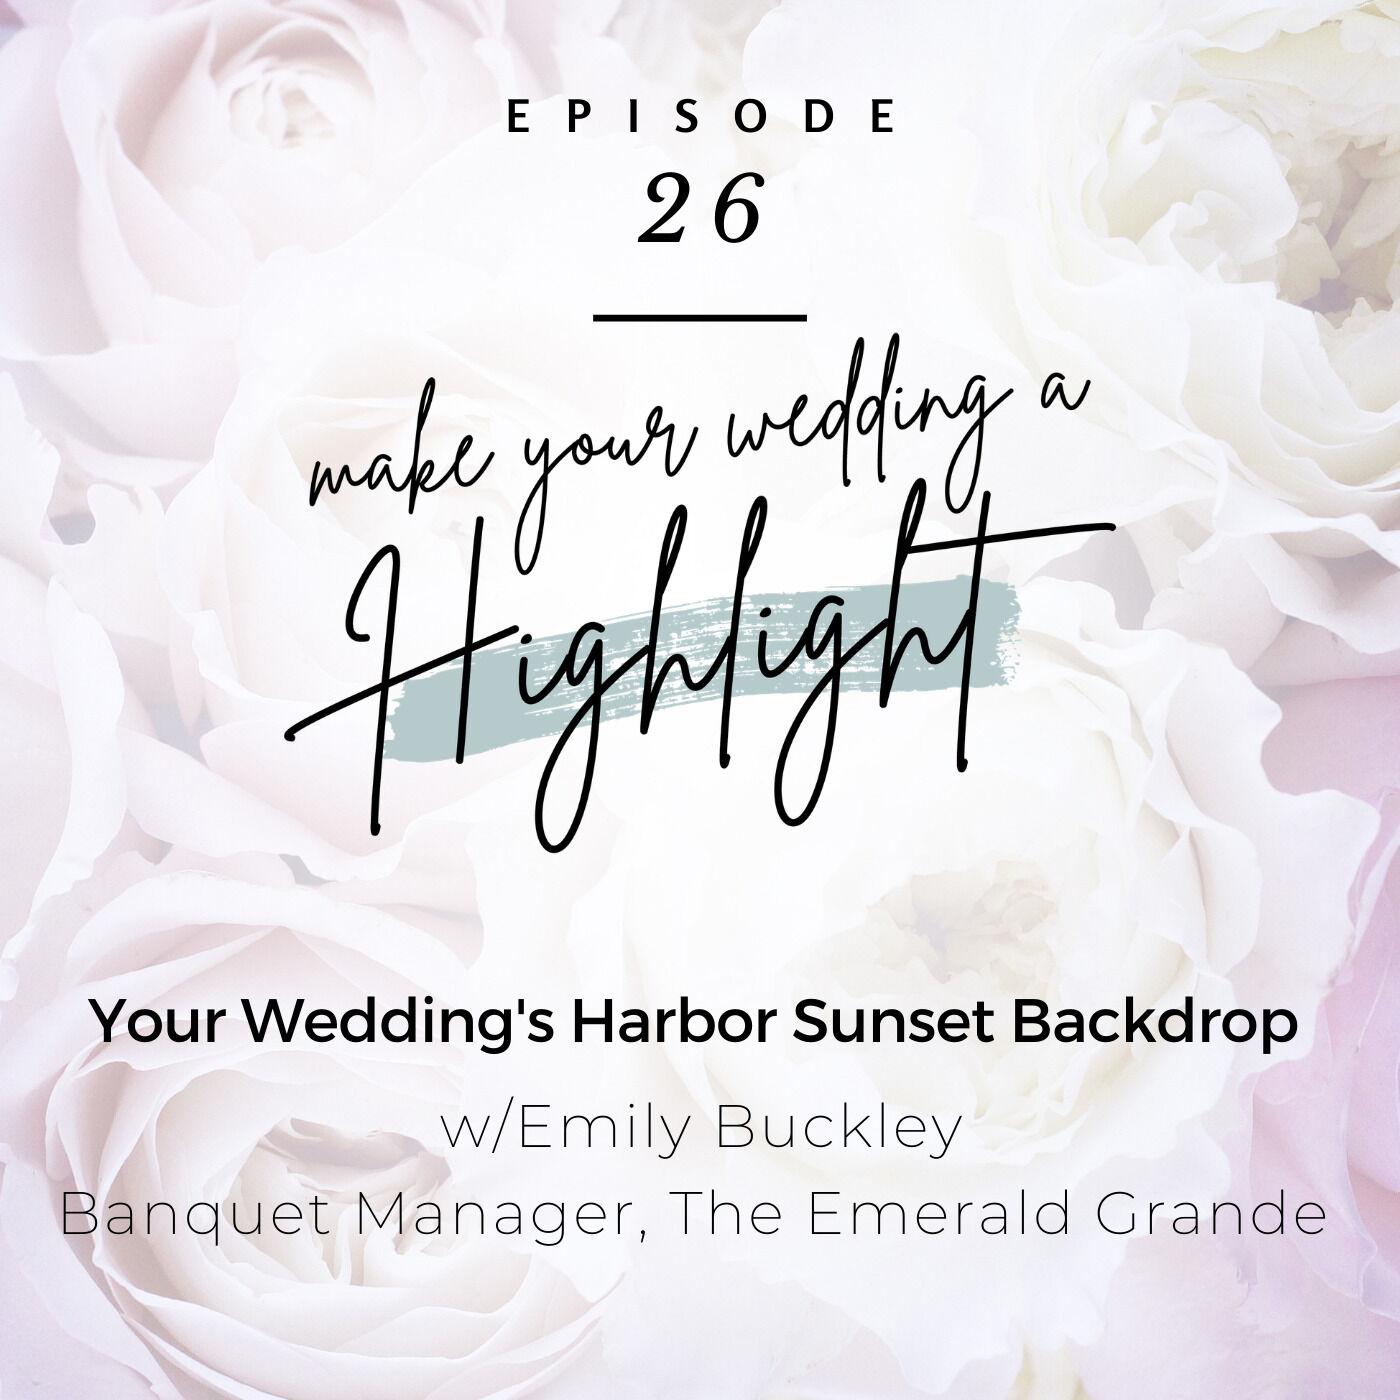 Your Wedding's Harbor Sunset Backdrop